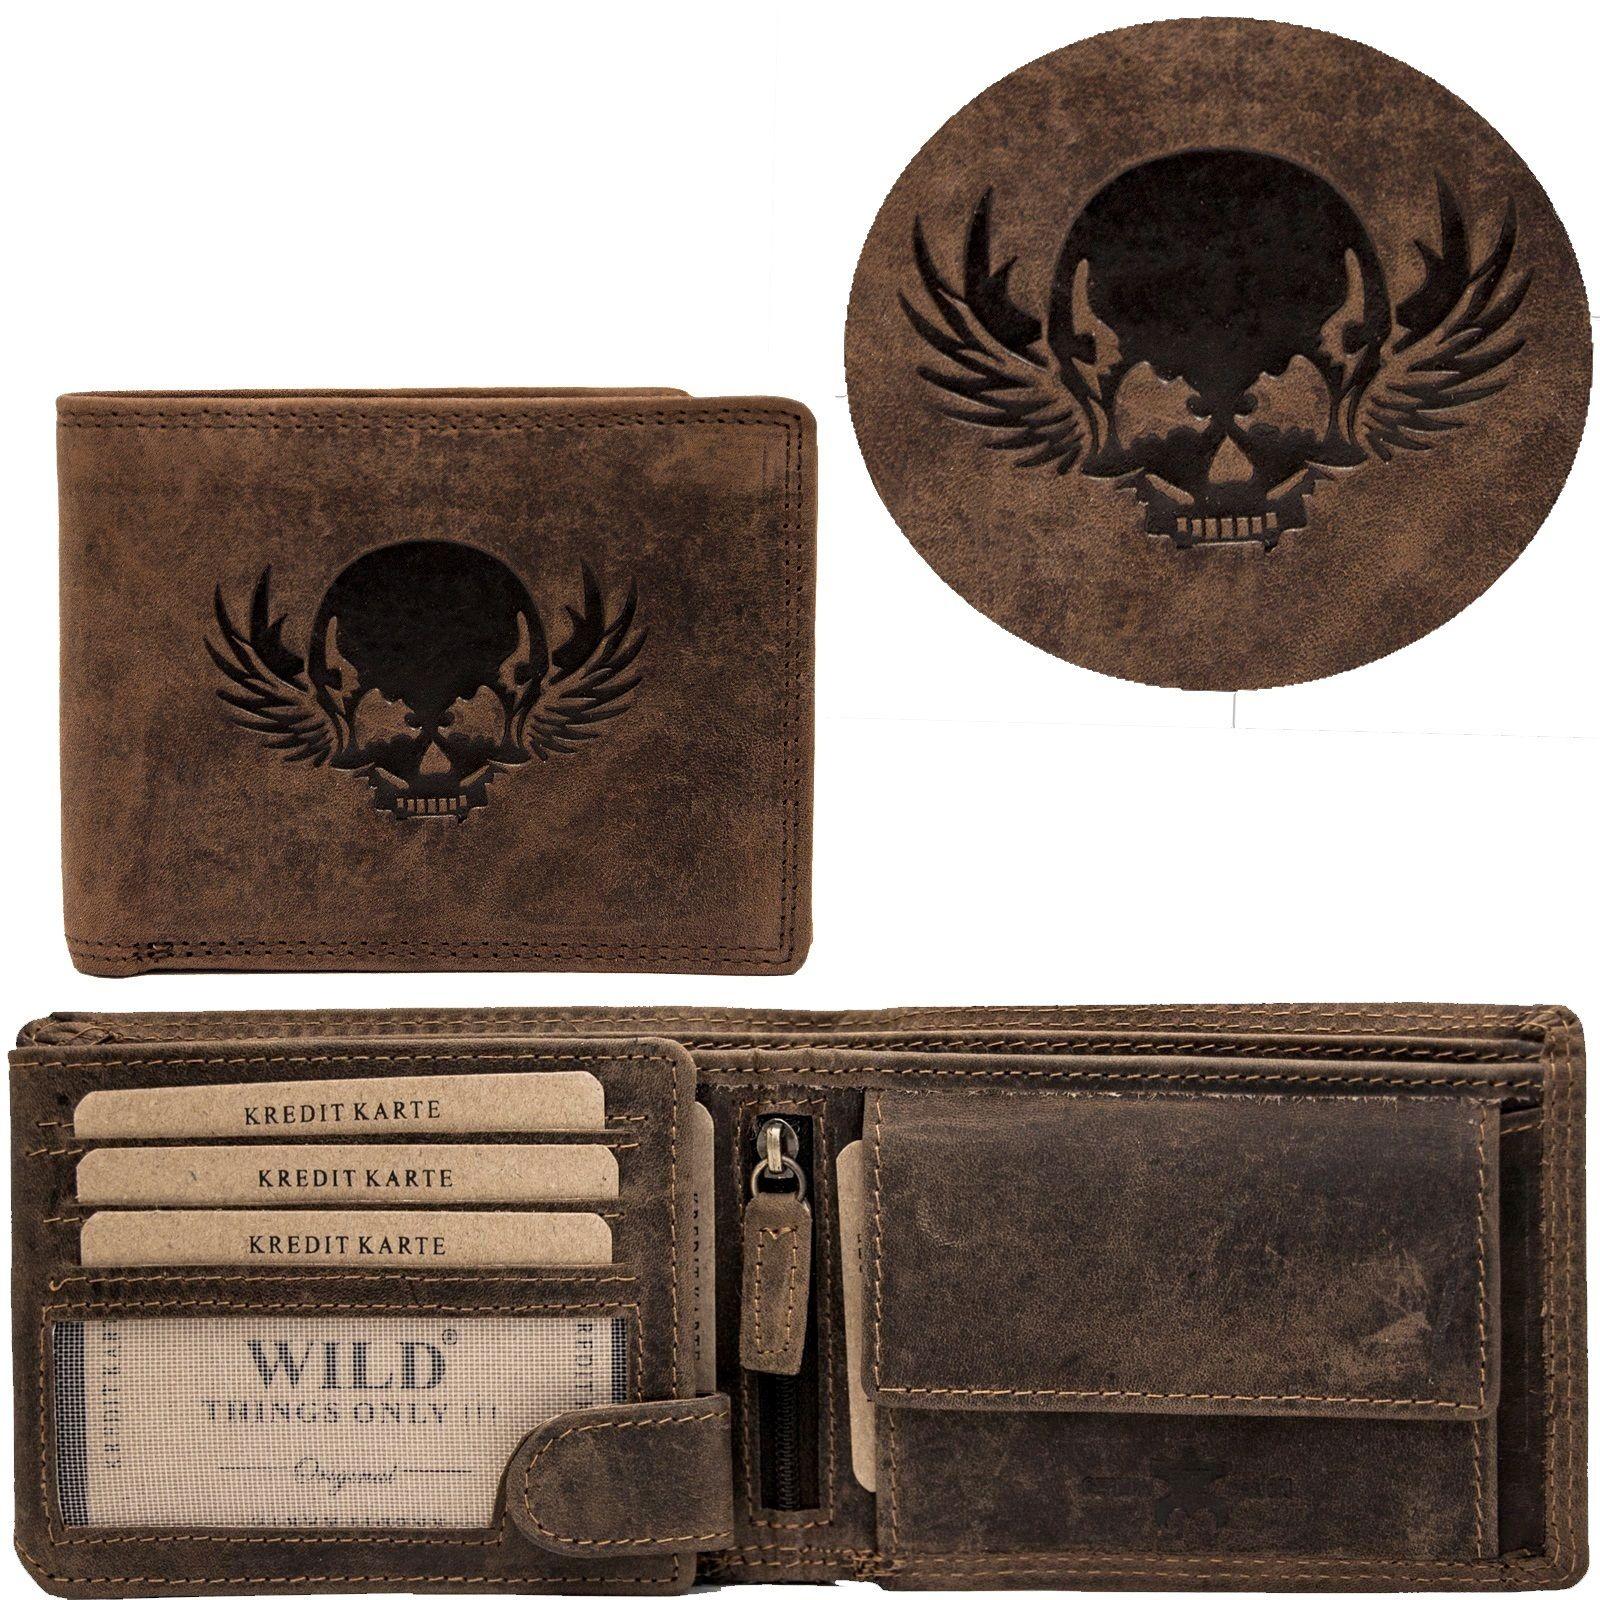 b2378a5016ecca Herren Leder Geldbörse Geldbeutel Brieftasche Männer echt Büffelleder  Totenkopf